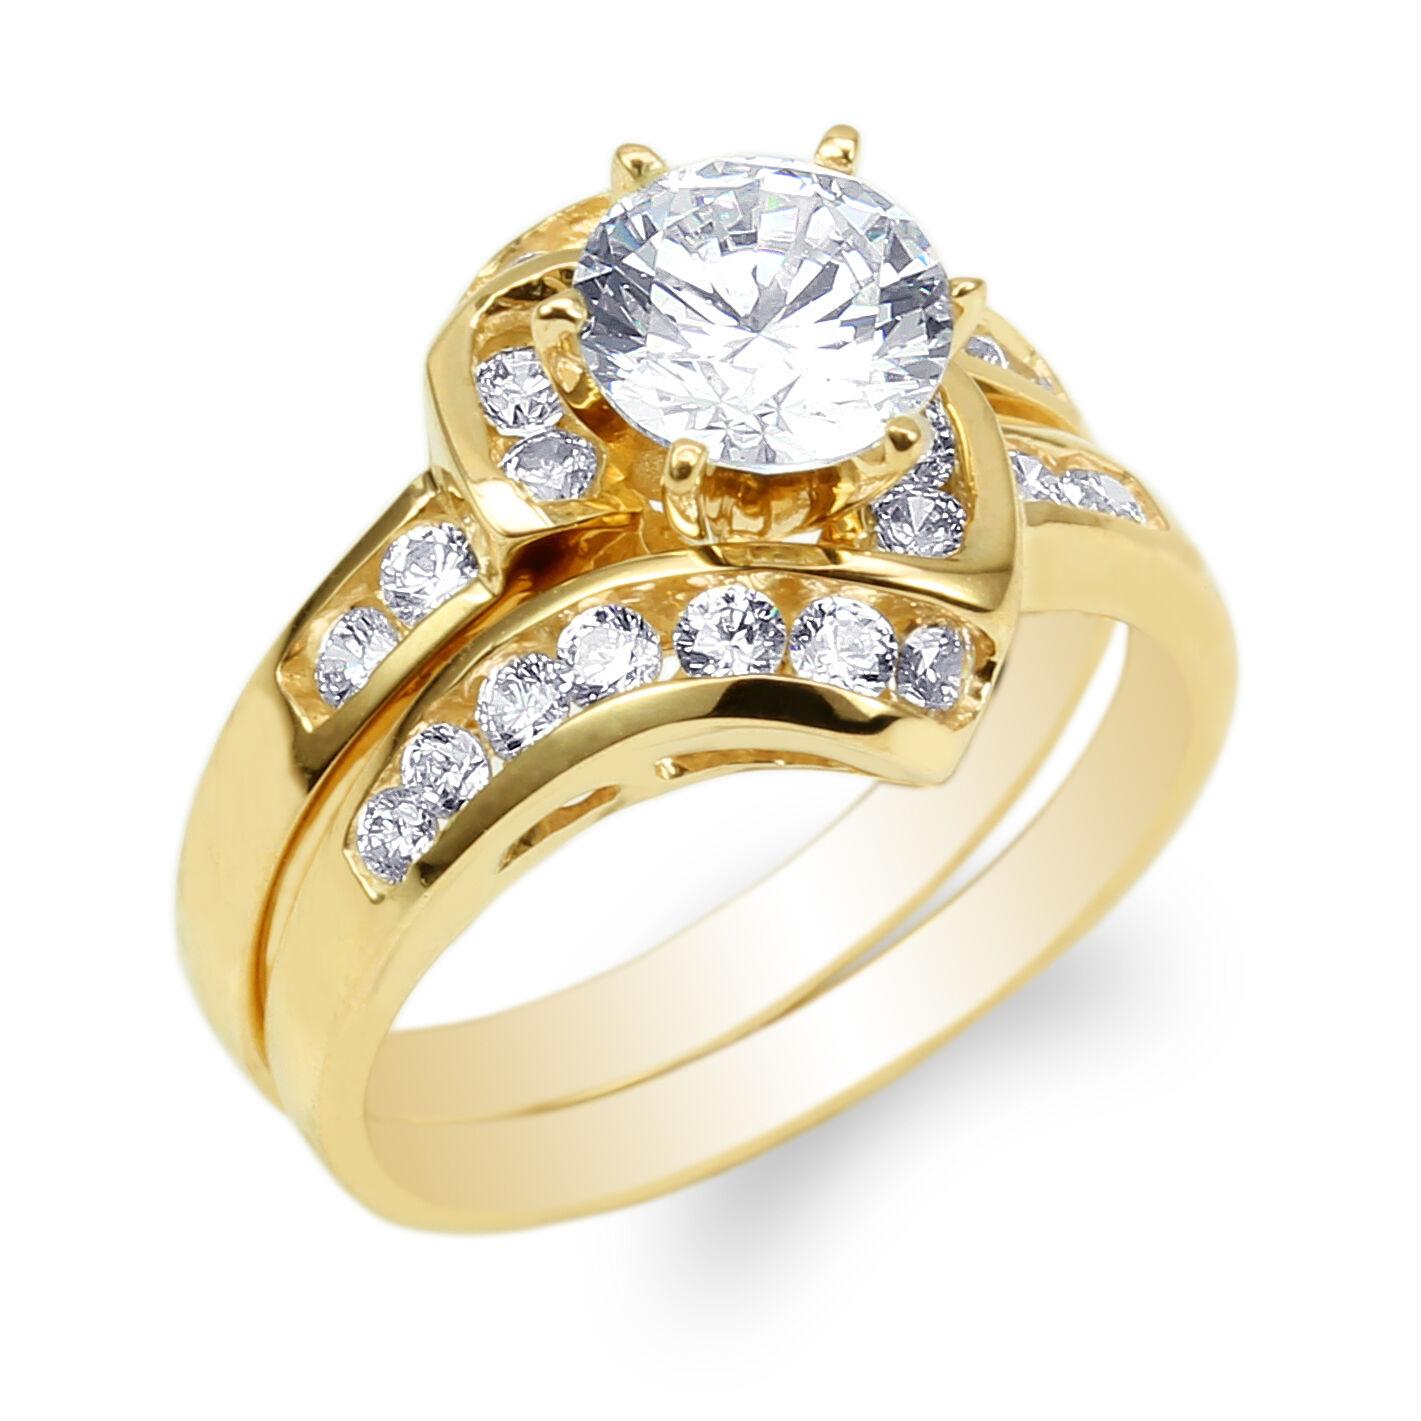 JamesJenny 14K Yellow gold Set 1.0ct Round CZ Engagement Wedding Ring Size 4-9